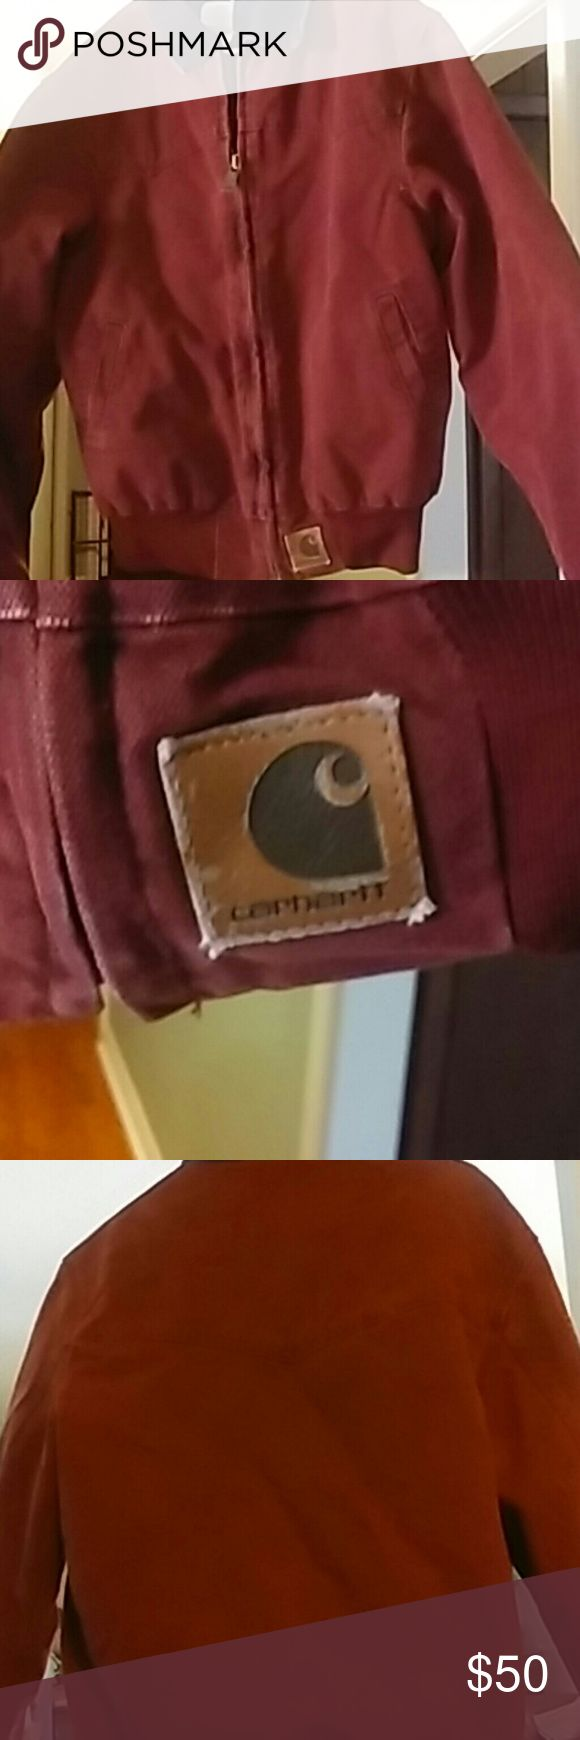 Men's Carhartt Coat Canvas rust colored coat. Two front pockets. Black collar. Zip up. Carhartt emblem on left bottom front Carhartt Jackets & Coats Lightweight & Shirt Jackets